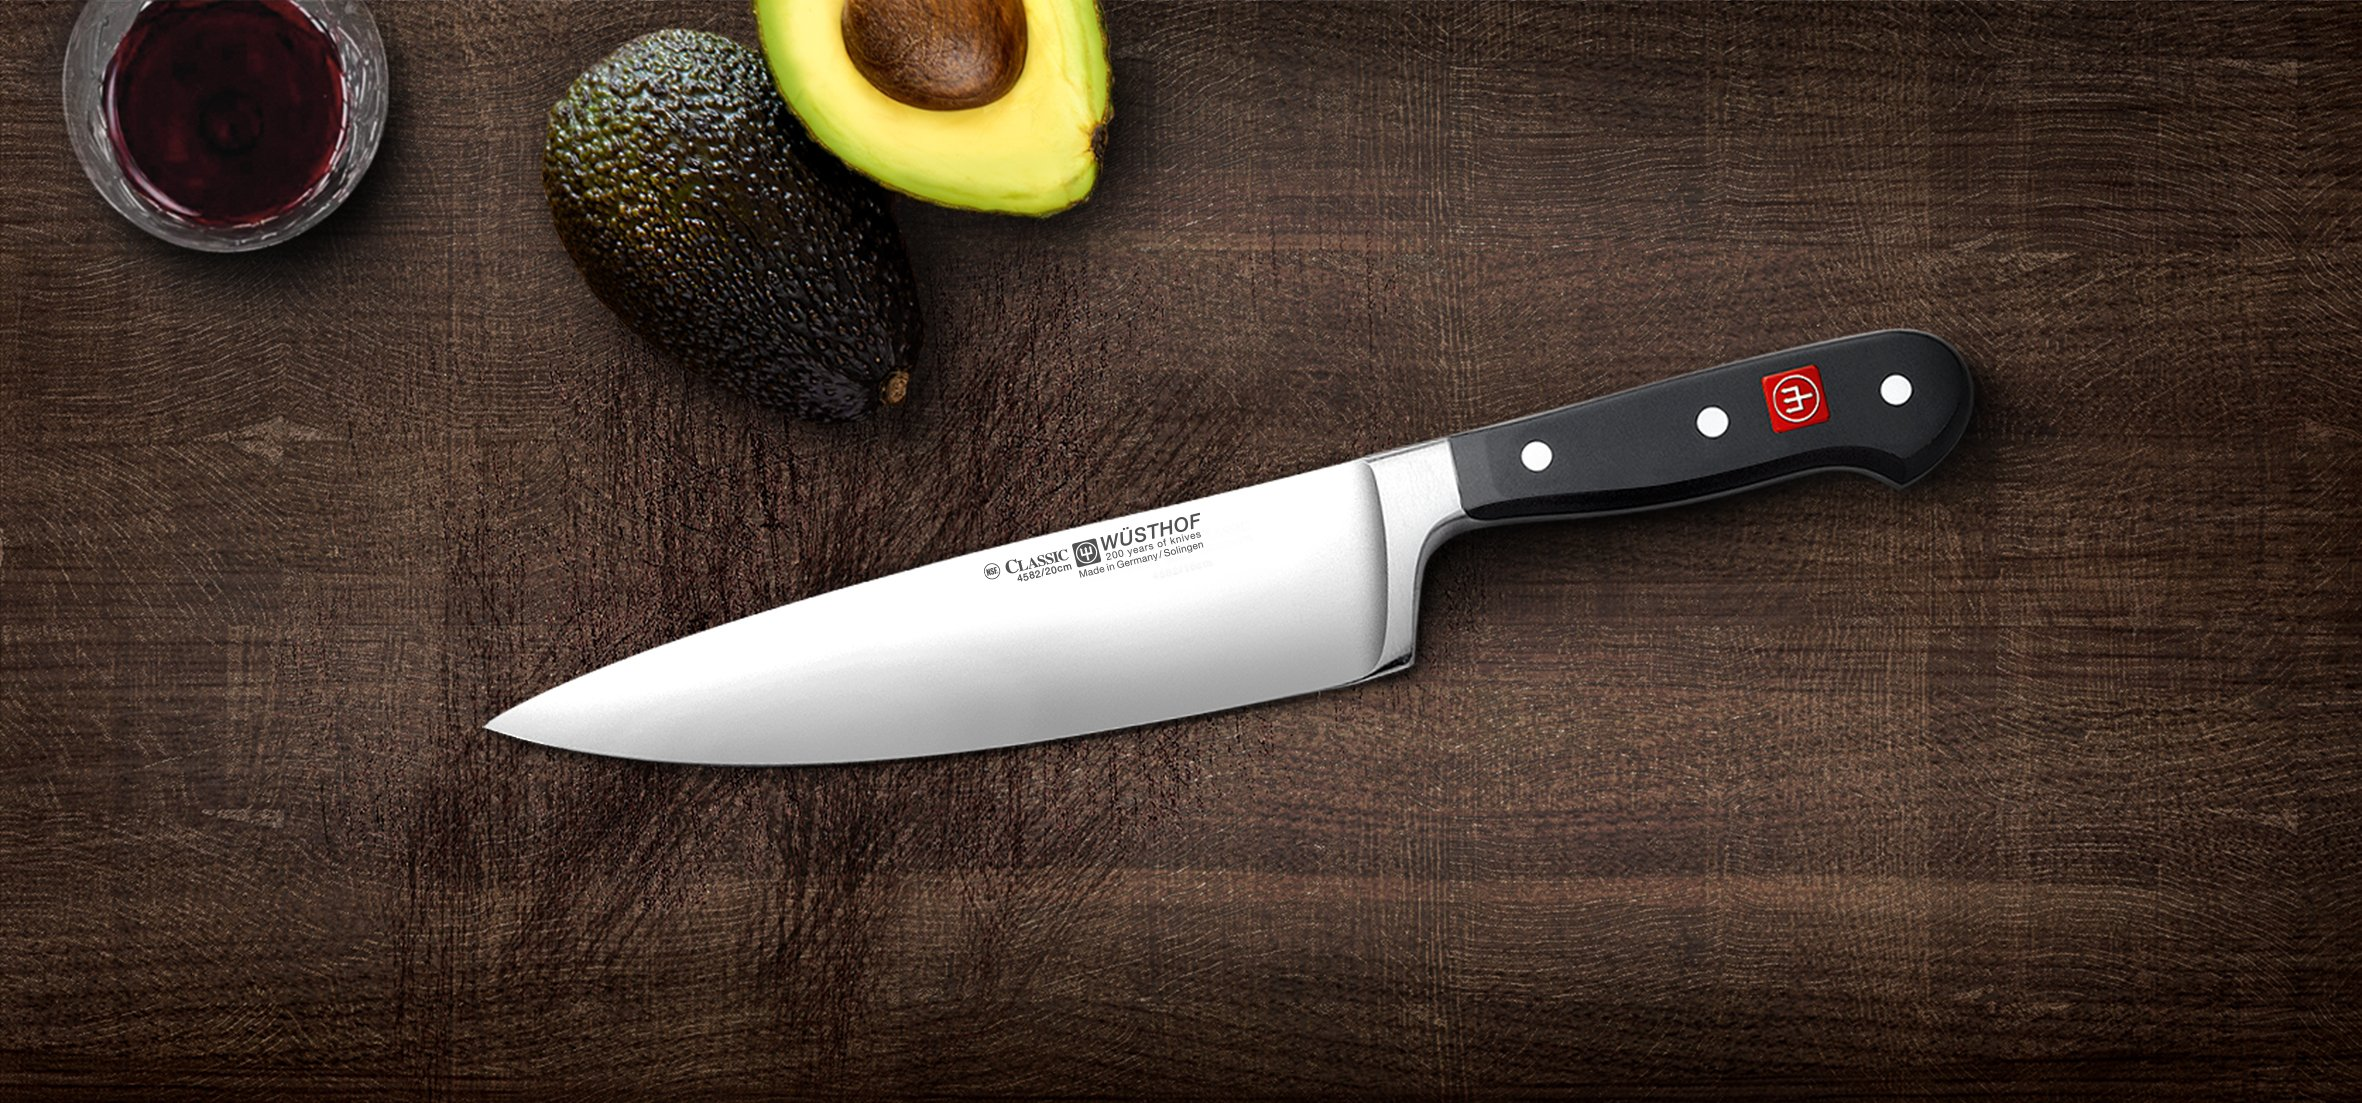 Wusthof Classic 8-Inch Chef's Knife